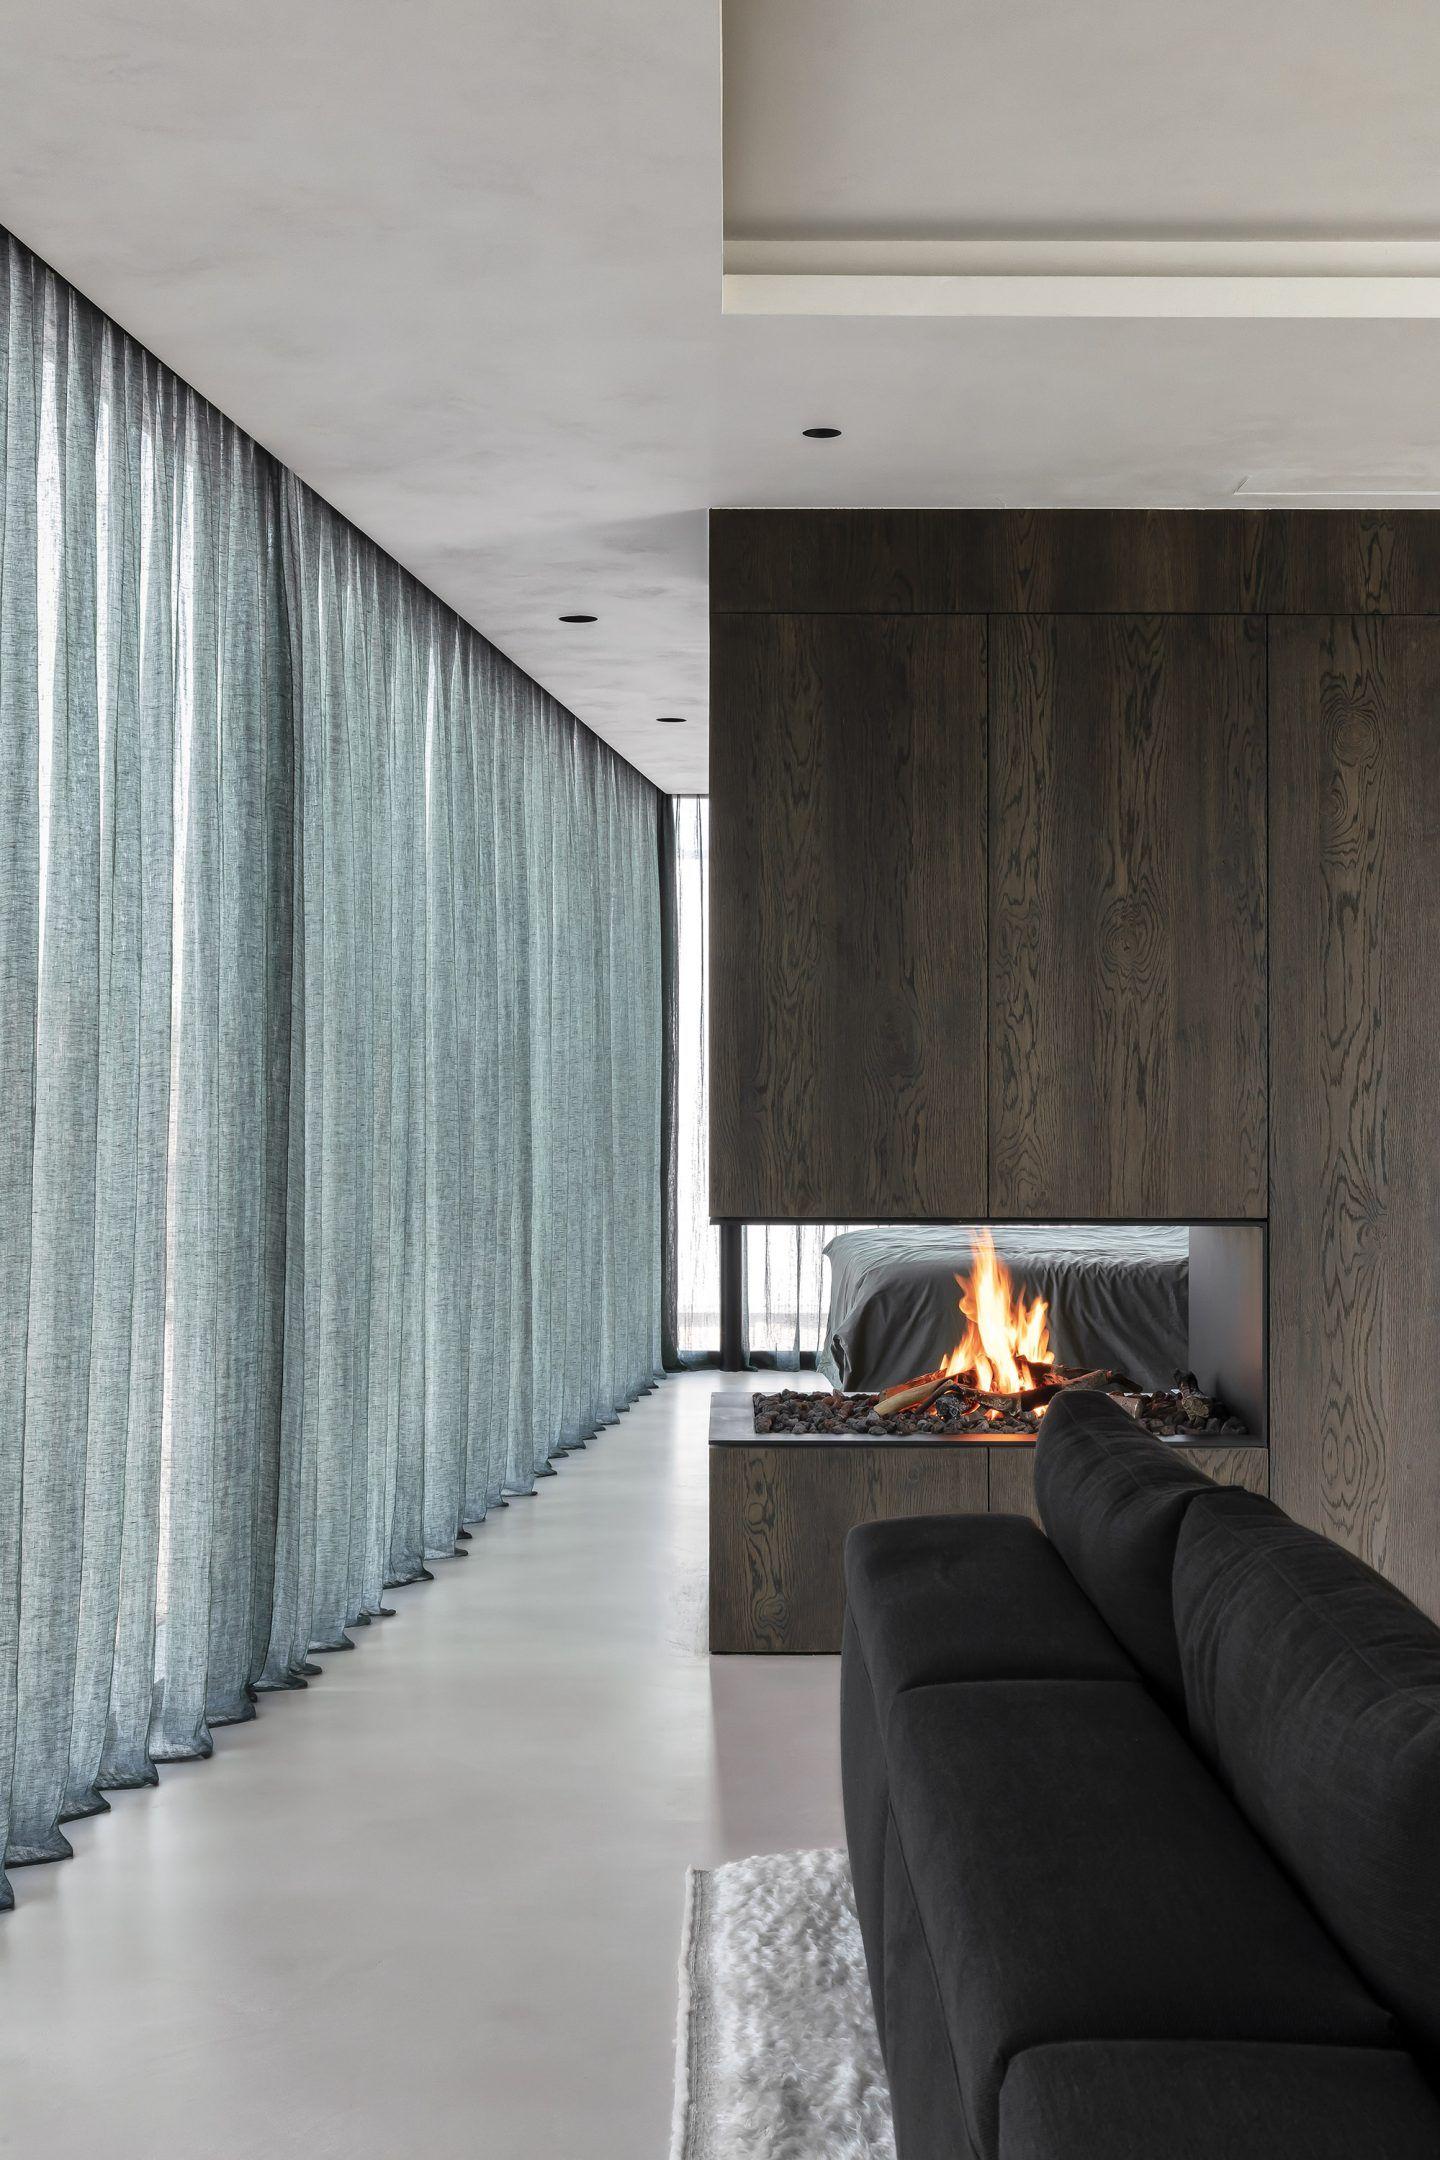 IGNANT-Architecture-Aarjan-de-Feyter-House-Ham-03